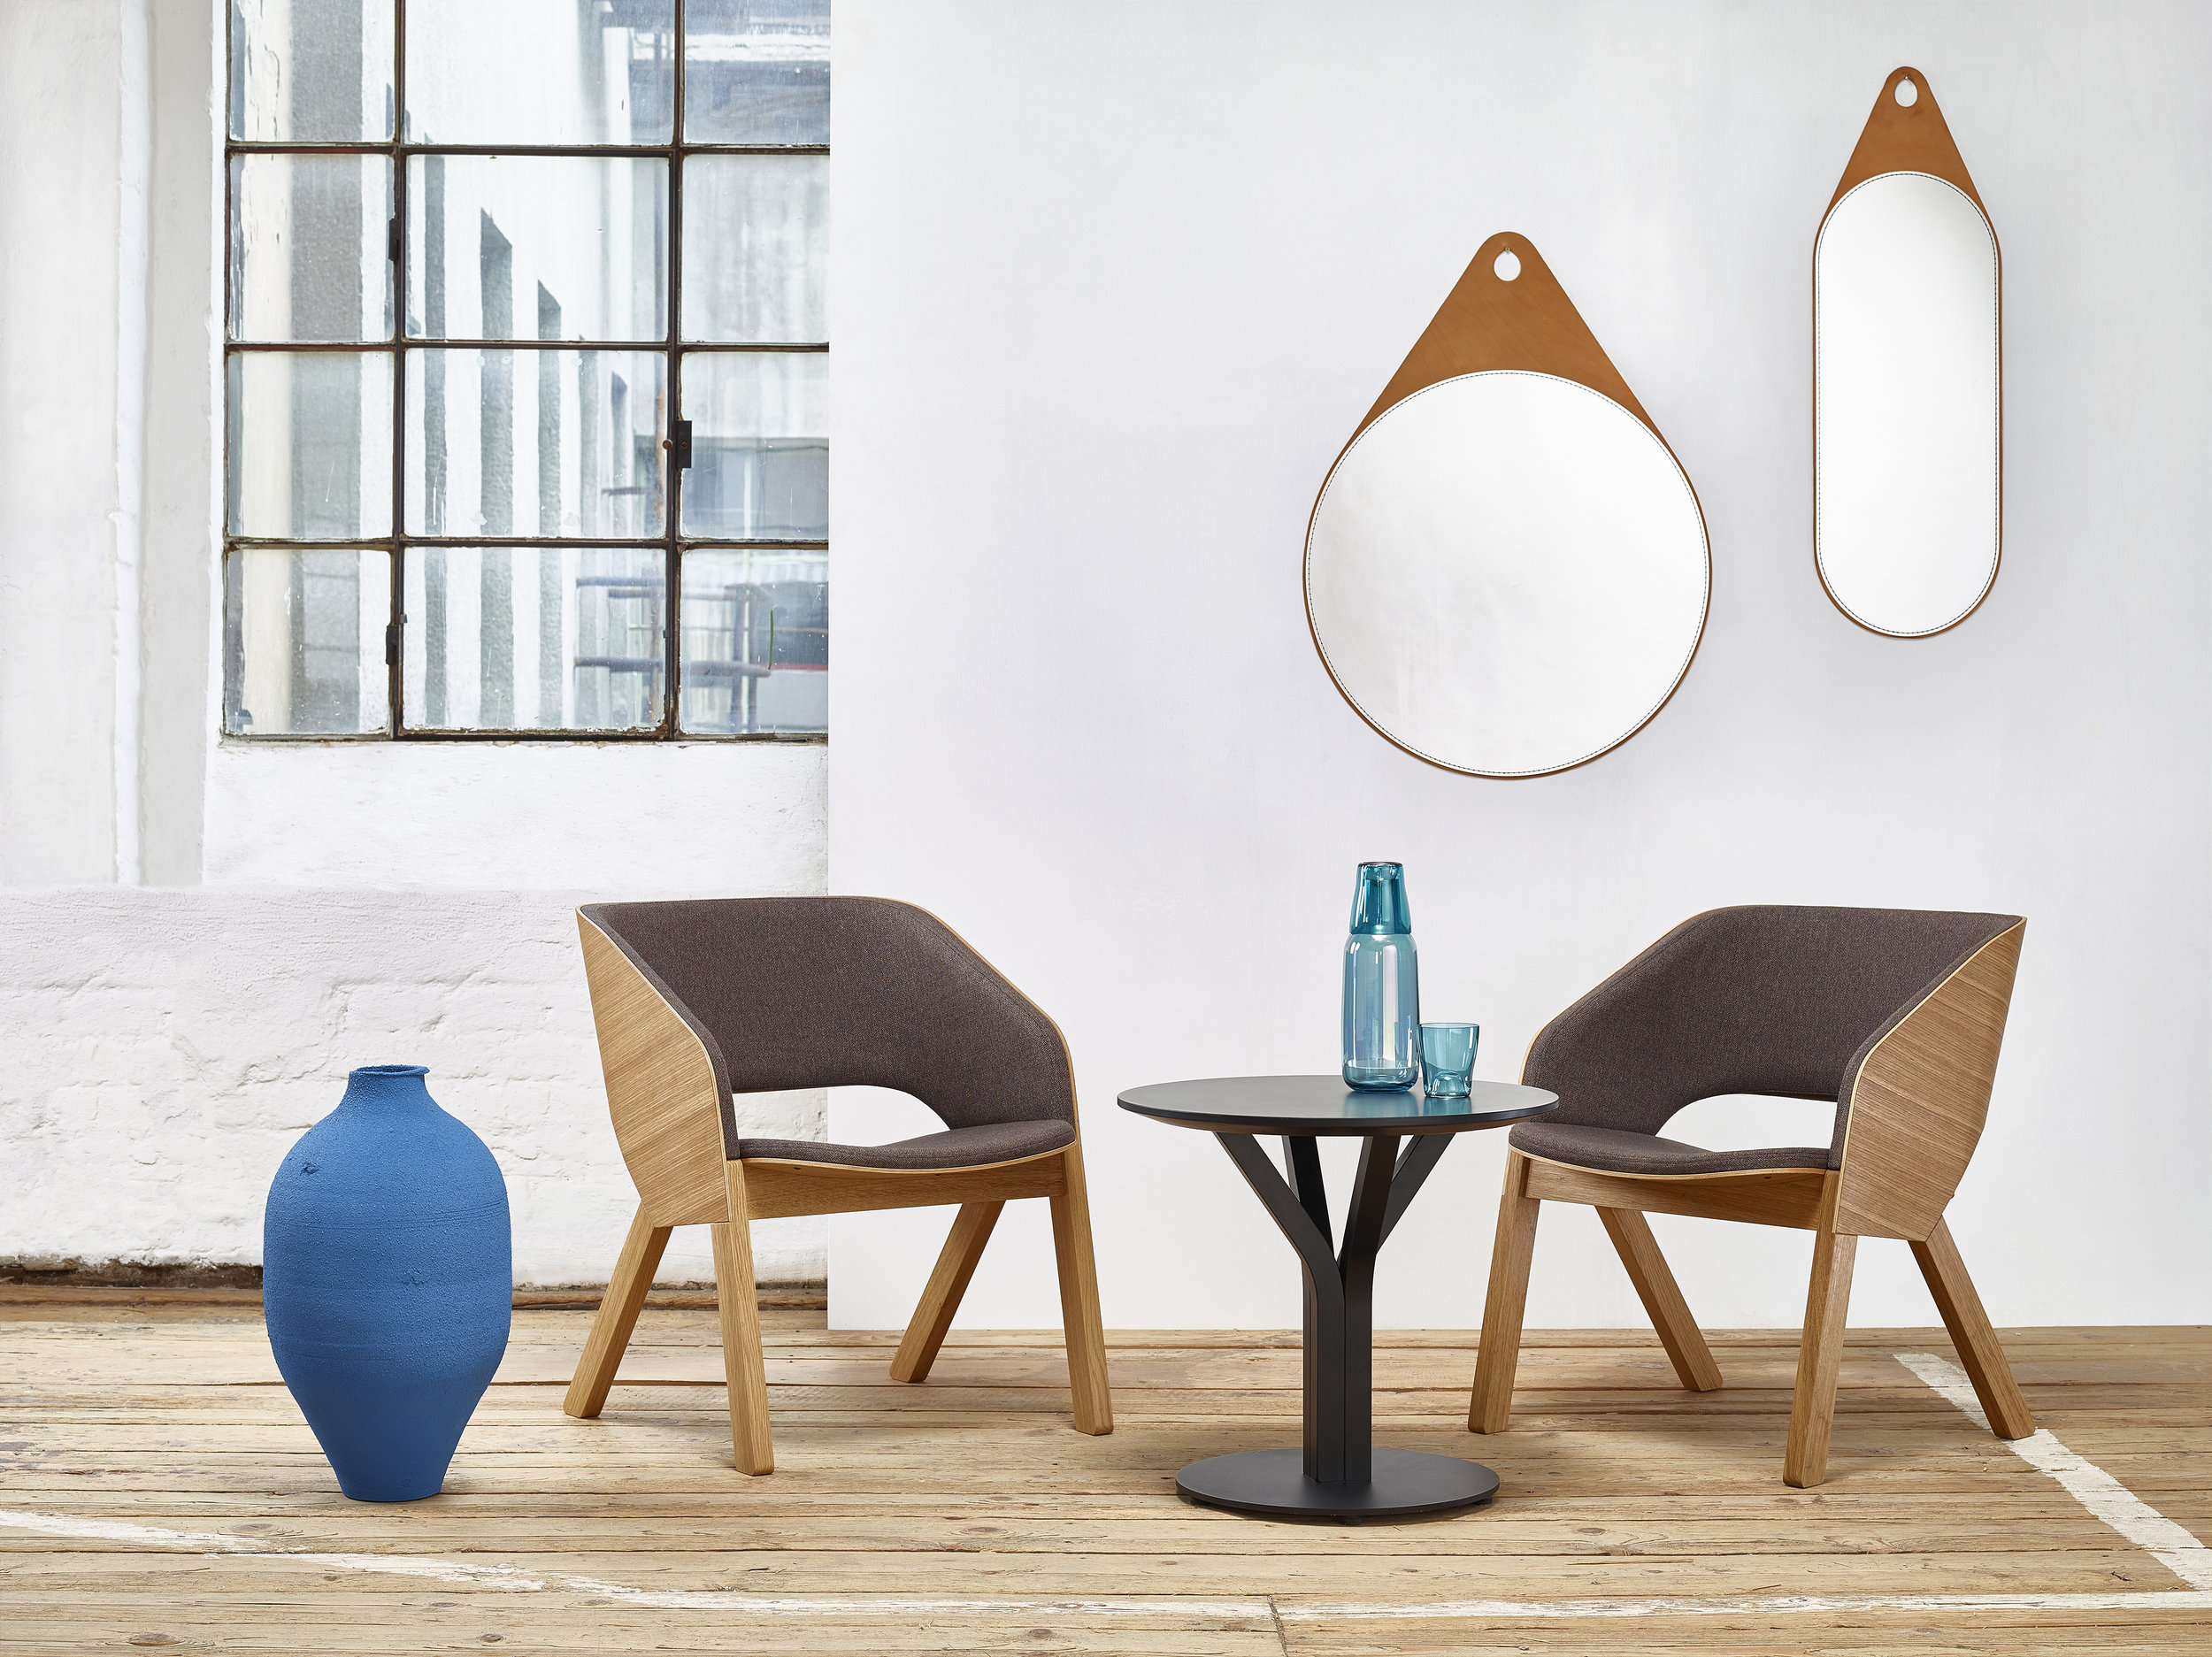 Merano lounge armchair & Bloom central_location.jpg